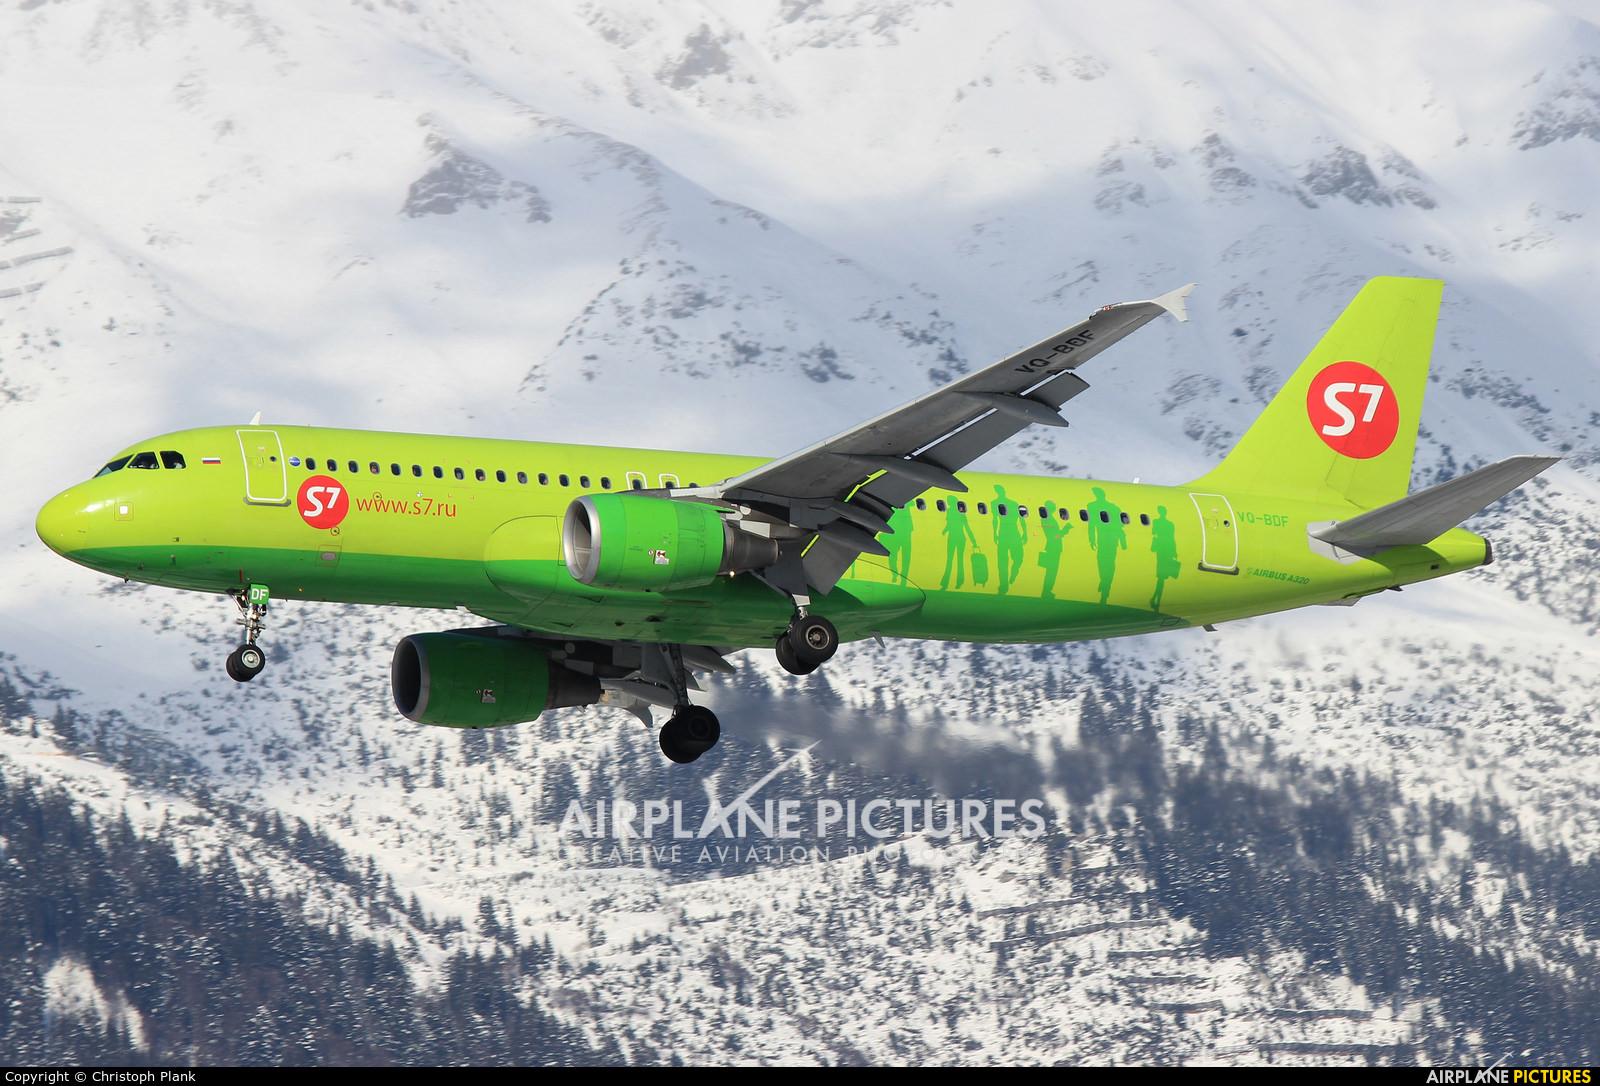 S7 Airlines VQ-BDF aircraft at Innsbruck